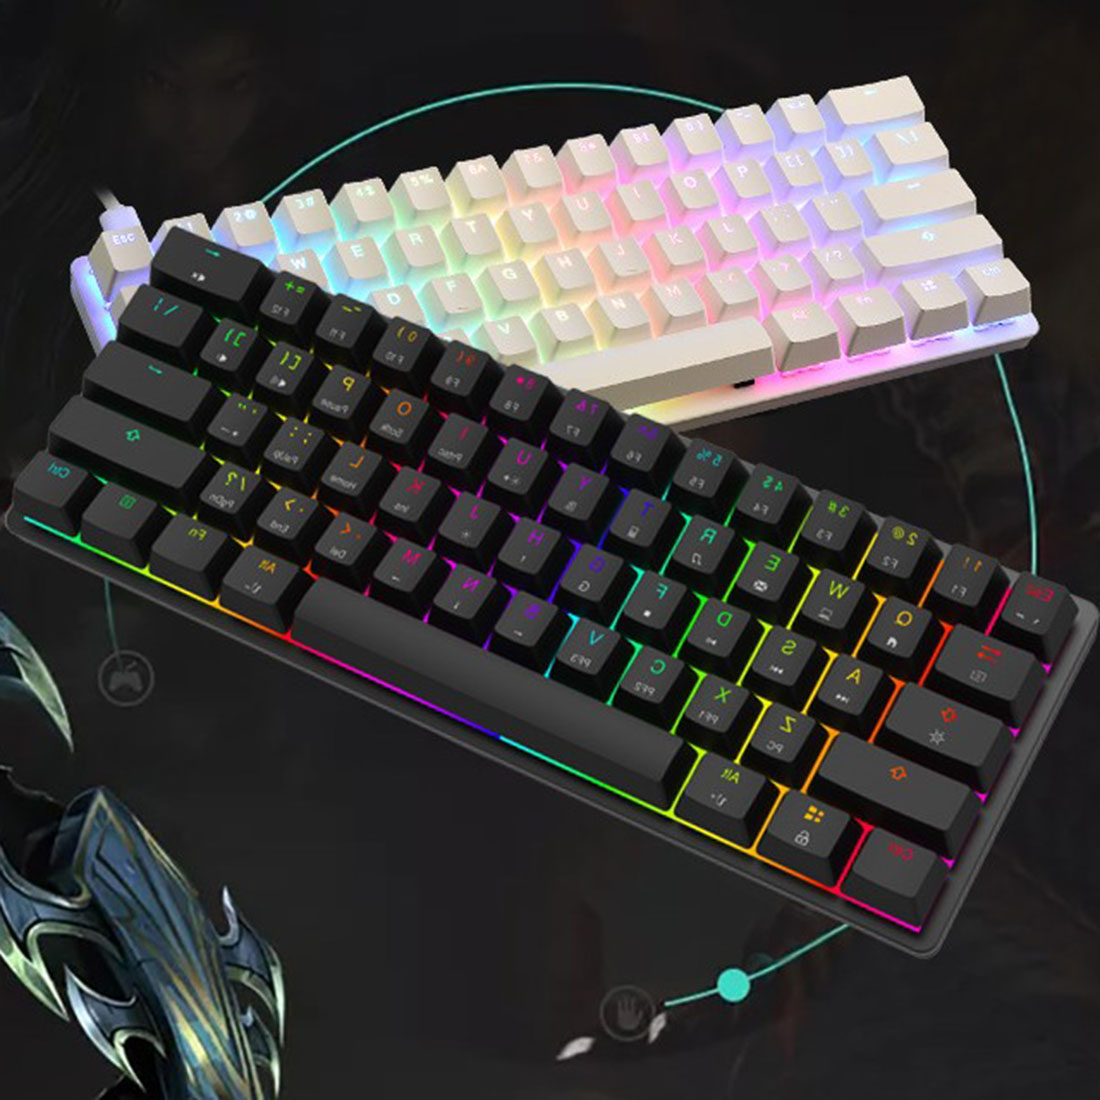 MK21 61-Key Gaming Mechanical Keyboard Wired RGB Backlit for Windows /Mac /Andoid